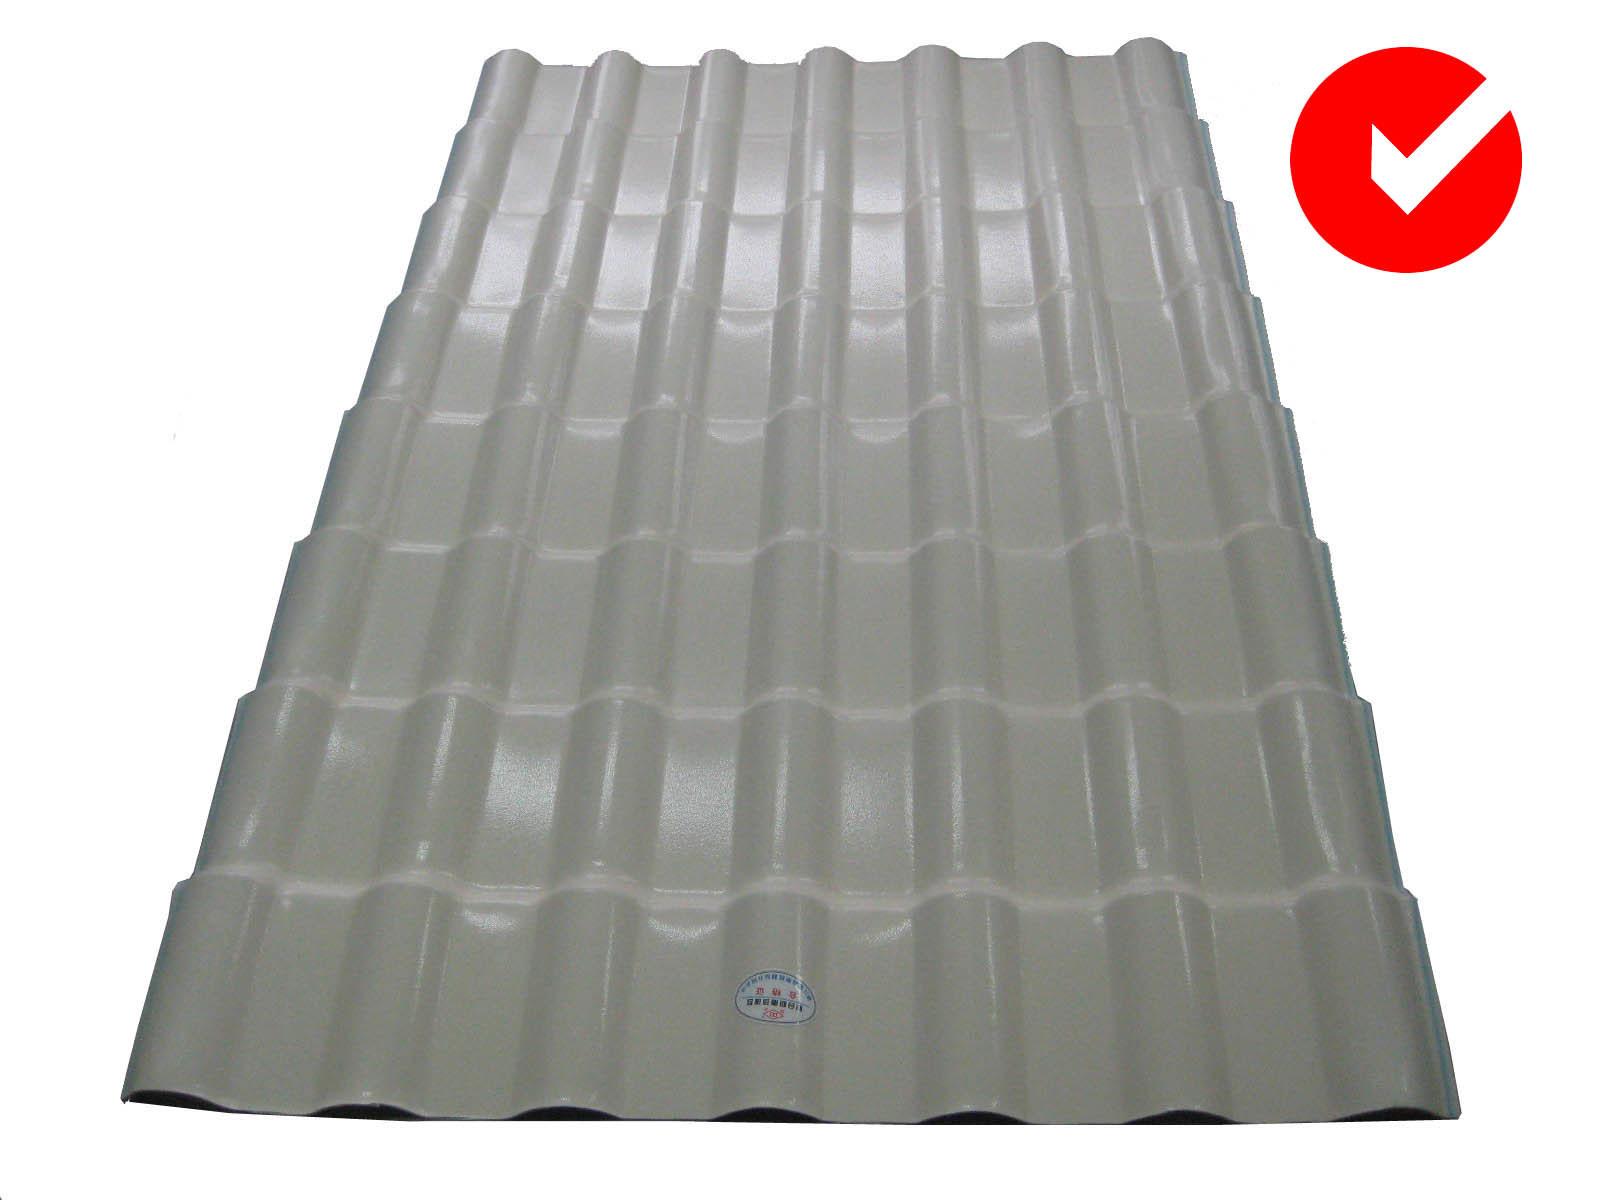 fornecido por Zhejiang Degao Plastic Products Co. Ltd. para Lusofonia #CA0101 1600x1200